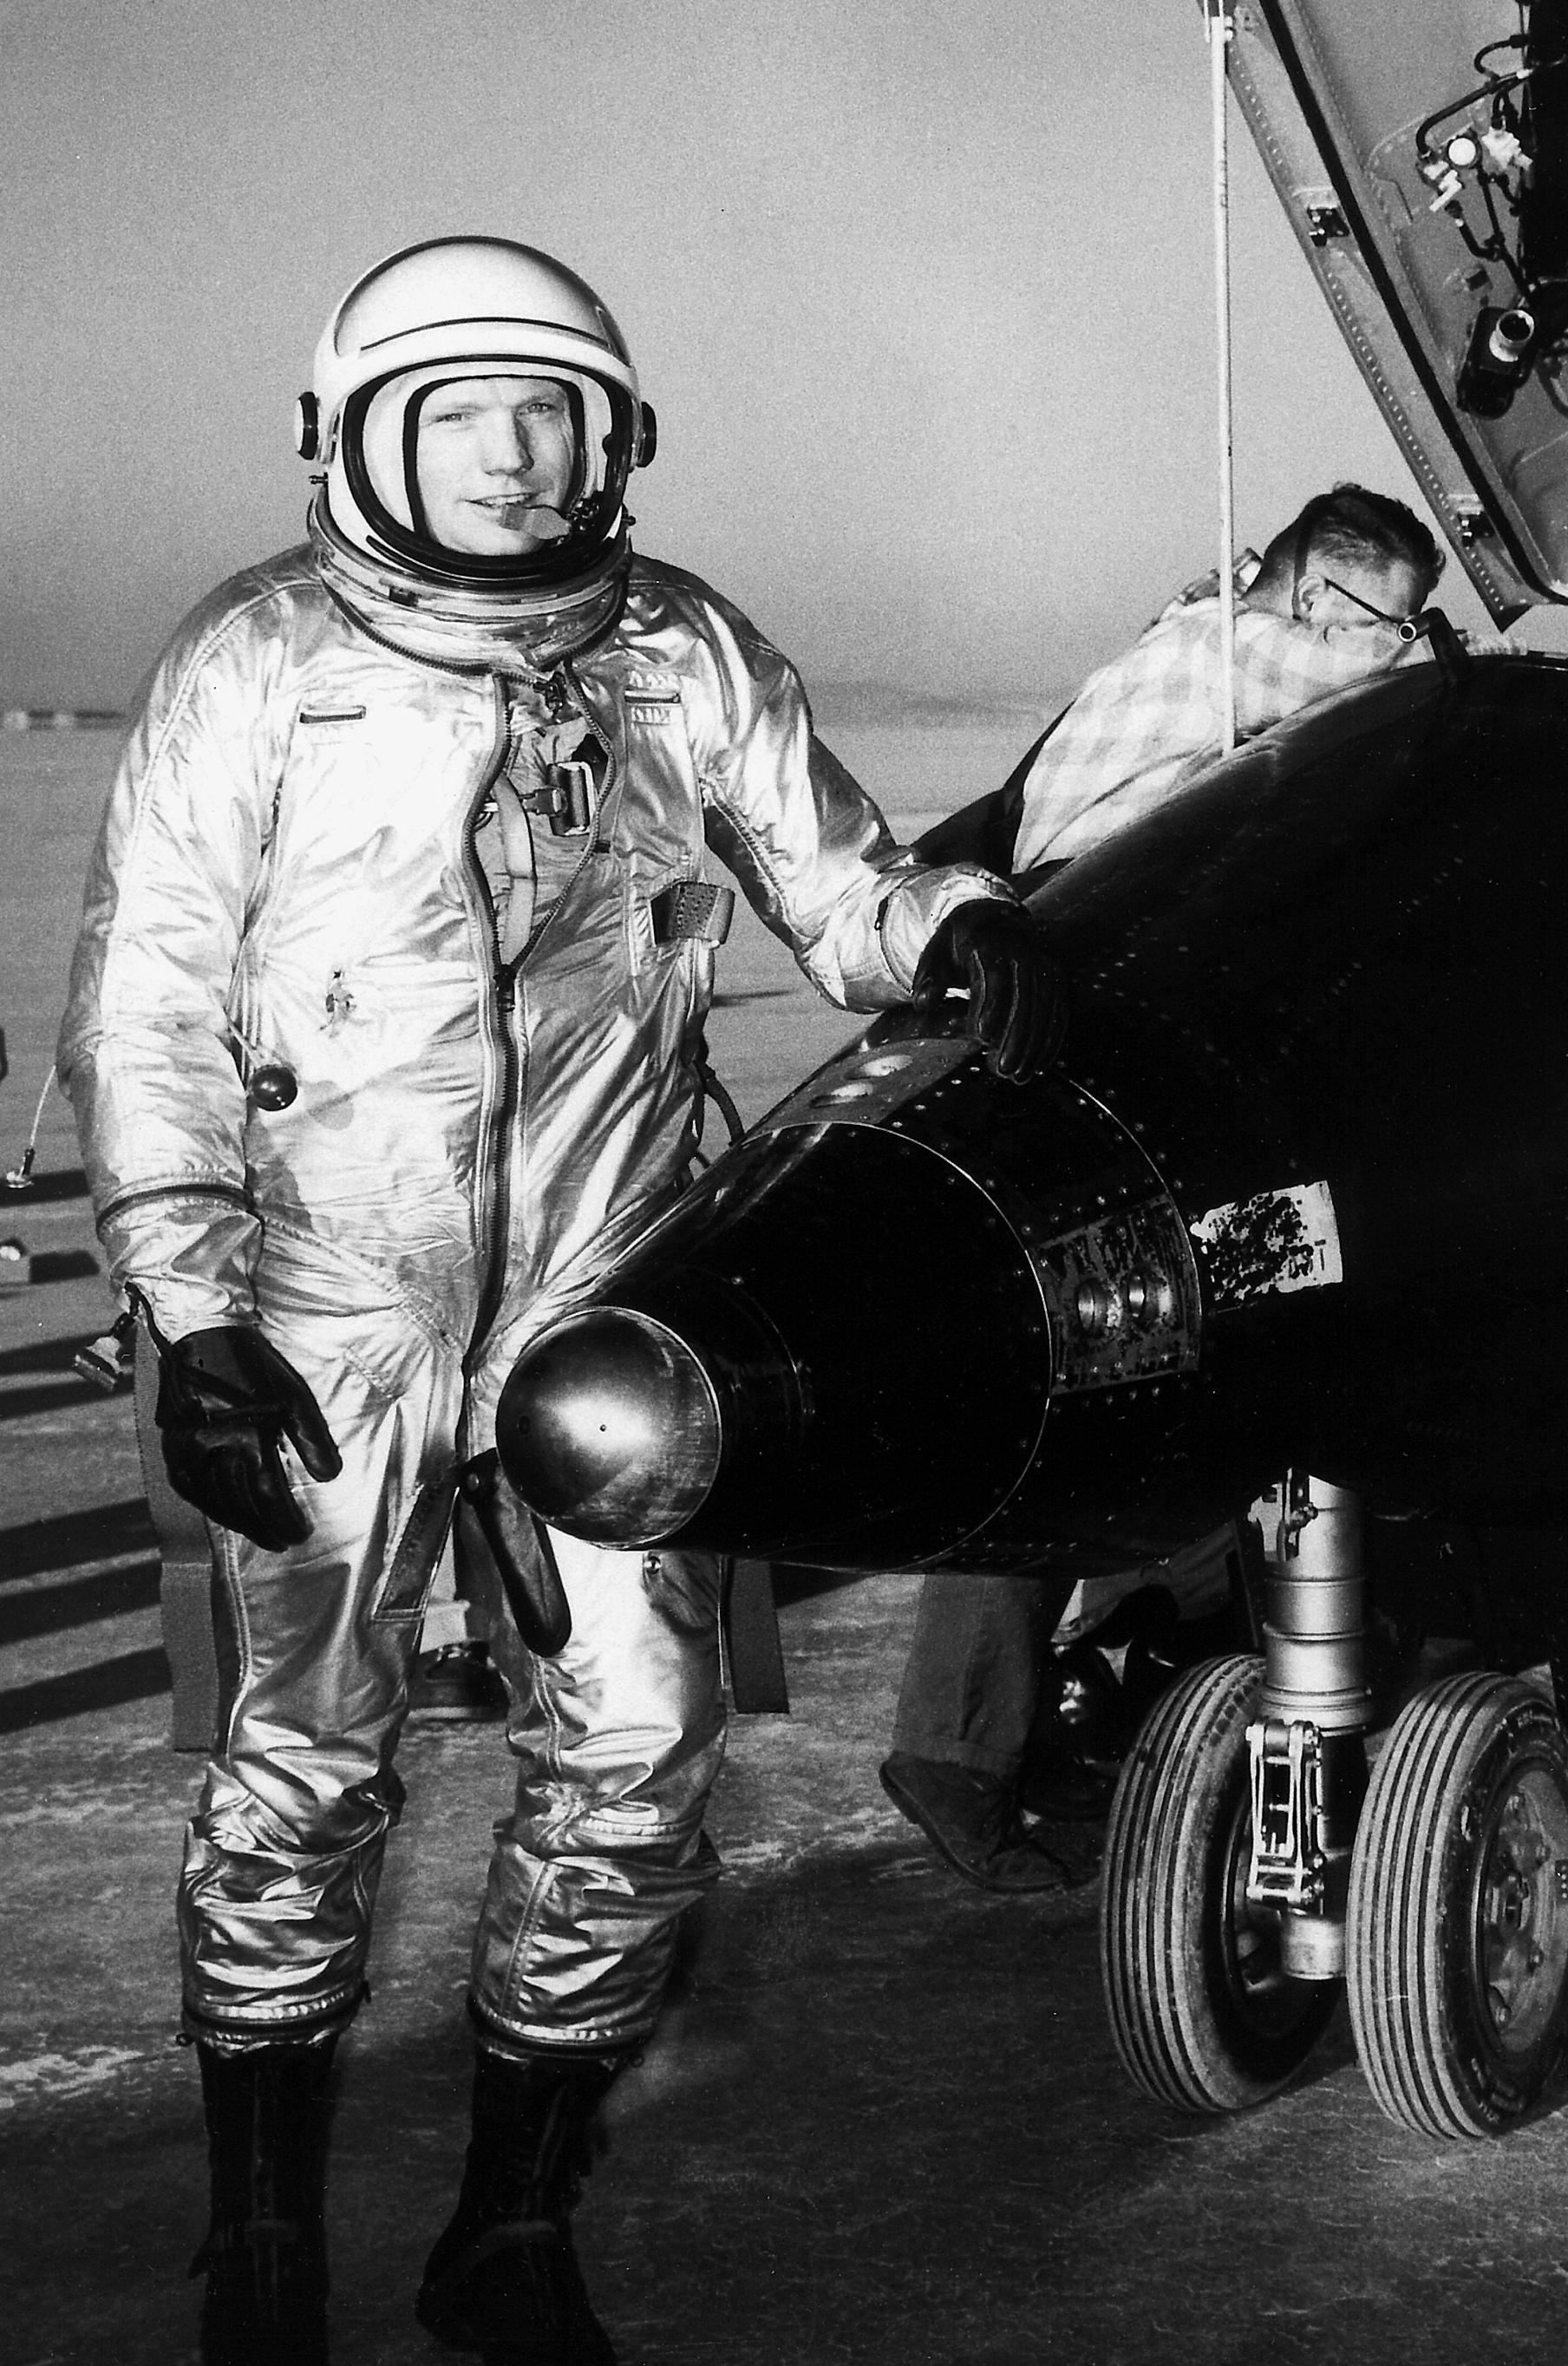 neil armstrong navy pilot - photo #16